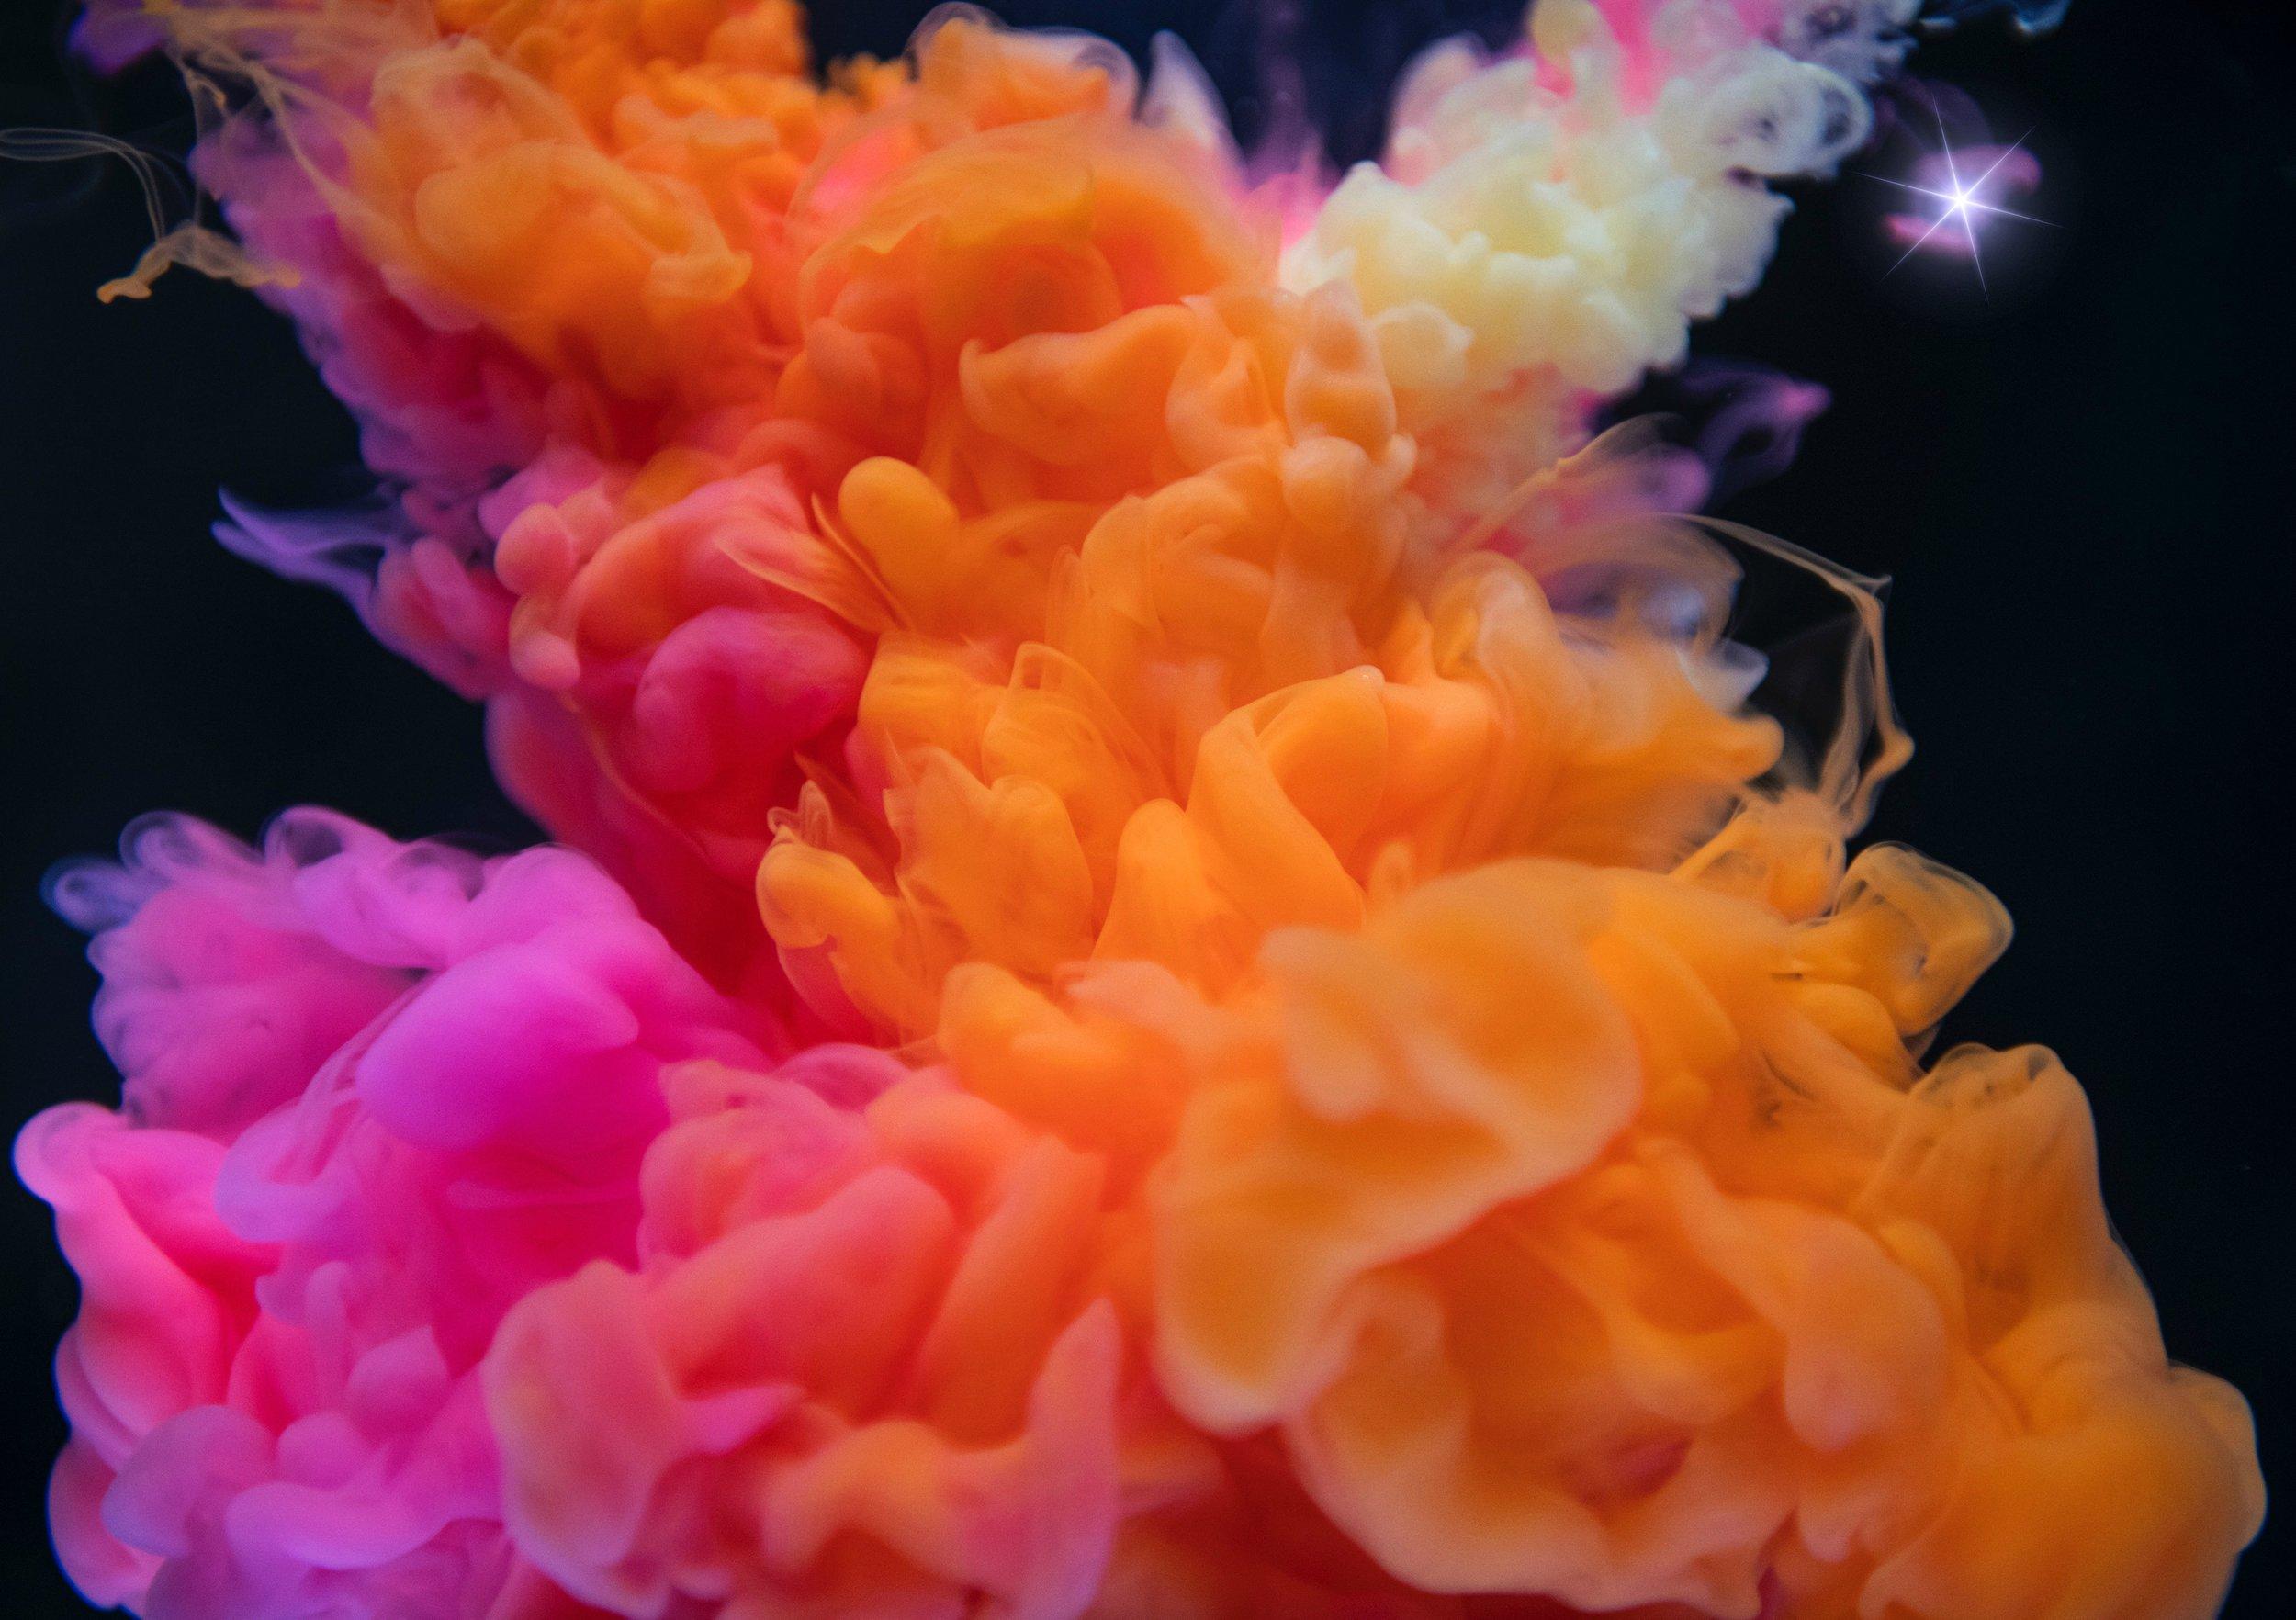 Glimmer abstract-art-artistic-1328891.jpg